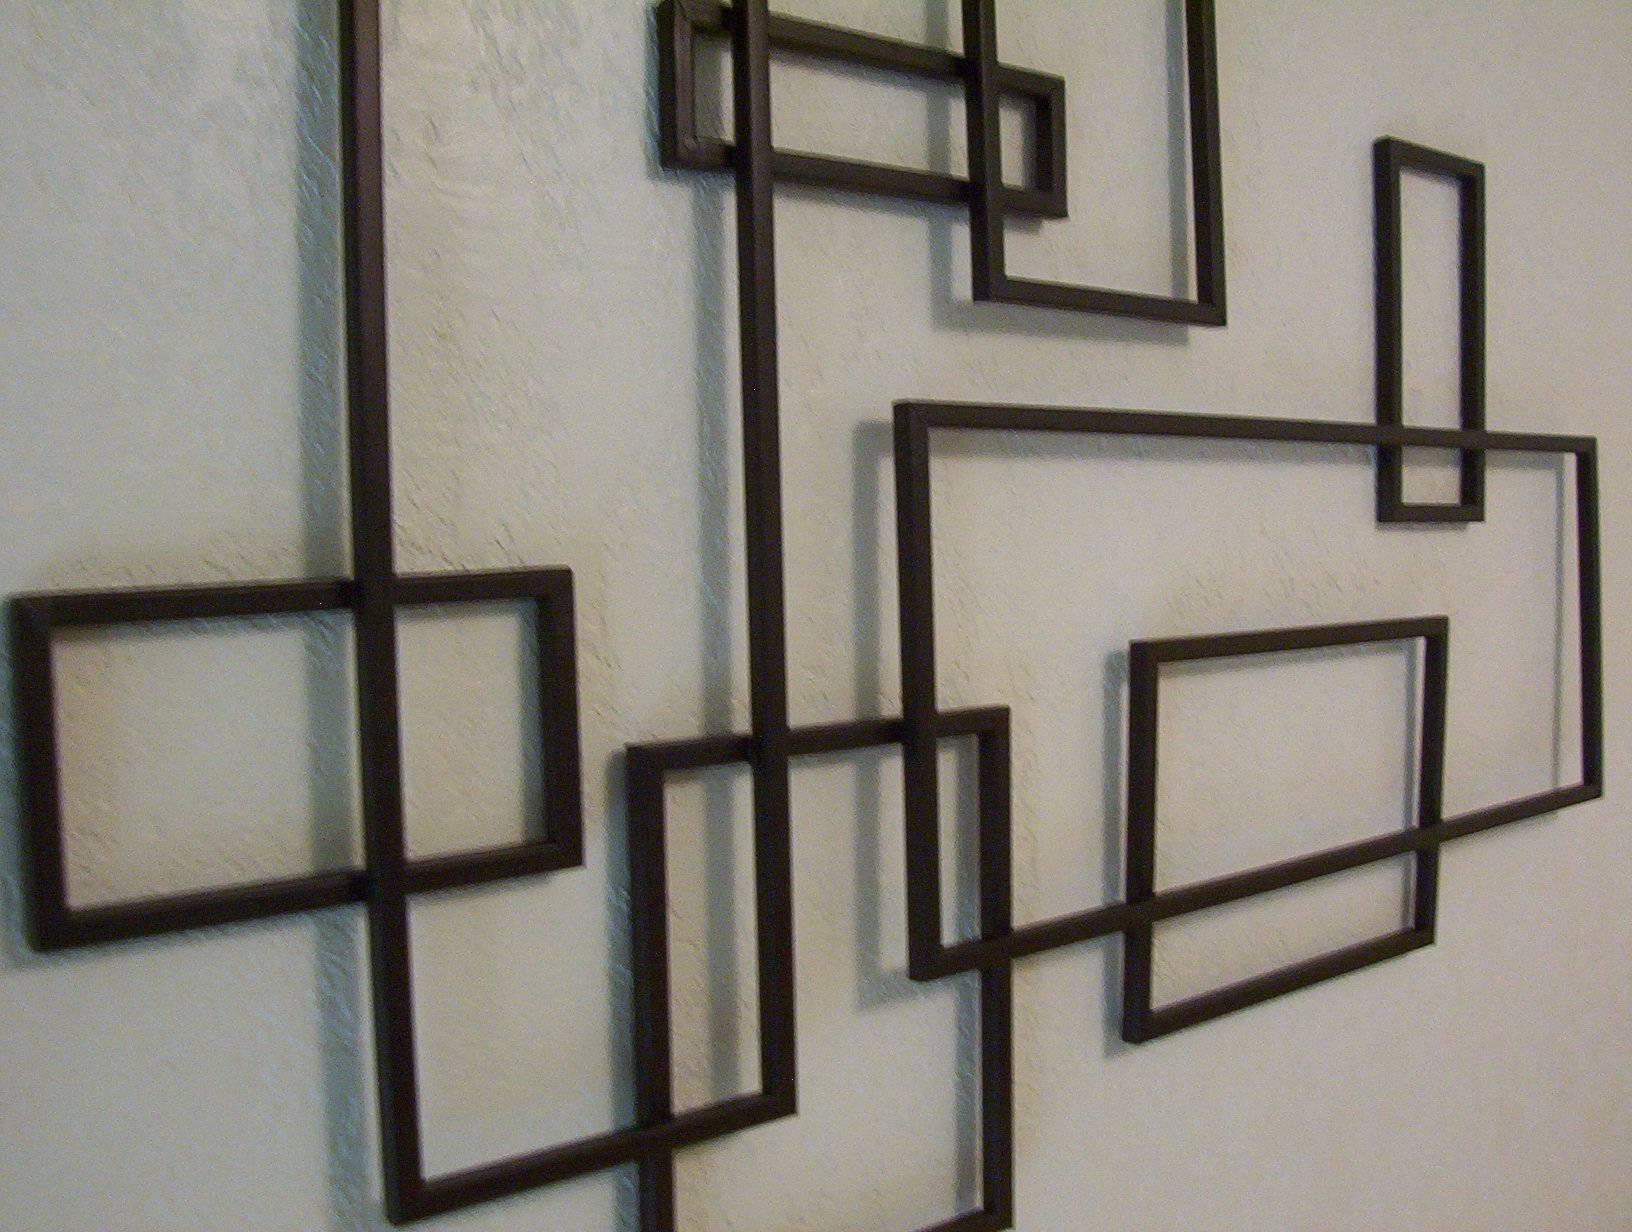 Marvelous Mid Century Modern Wall Art Ideas Pics Inspiration – Tikspor Regarding Newest Mid Century Modern Metal Wall Art (View 7 of 20)